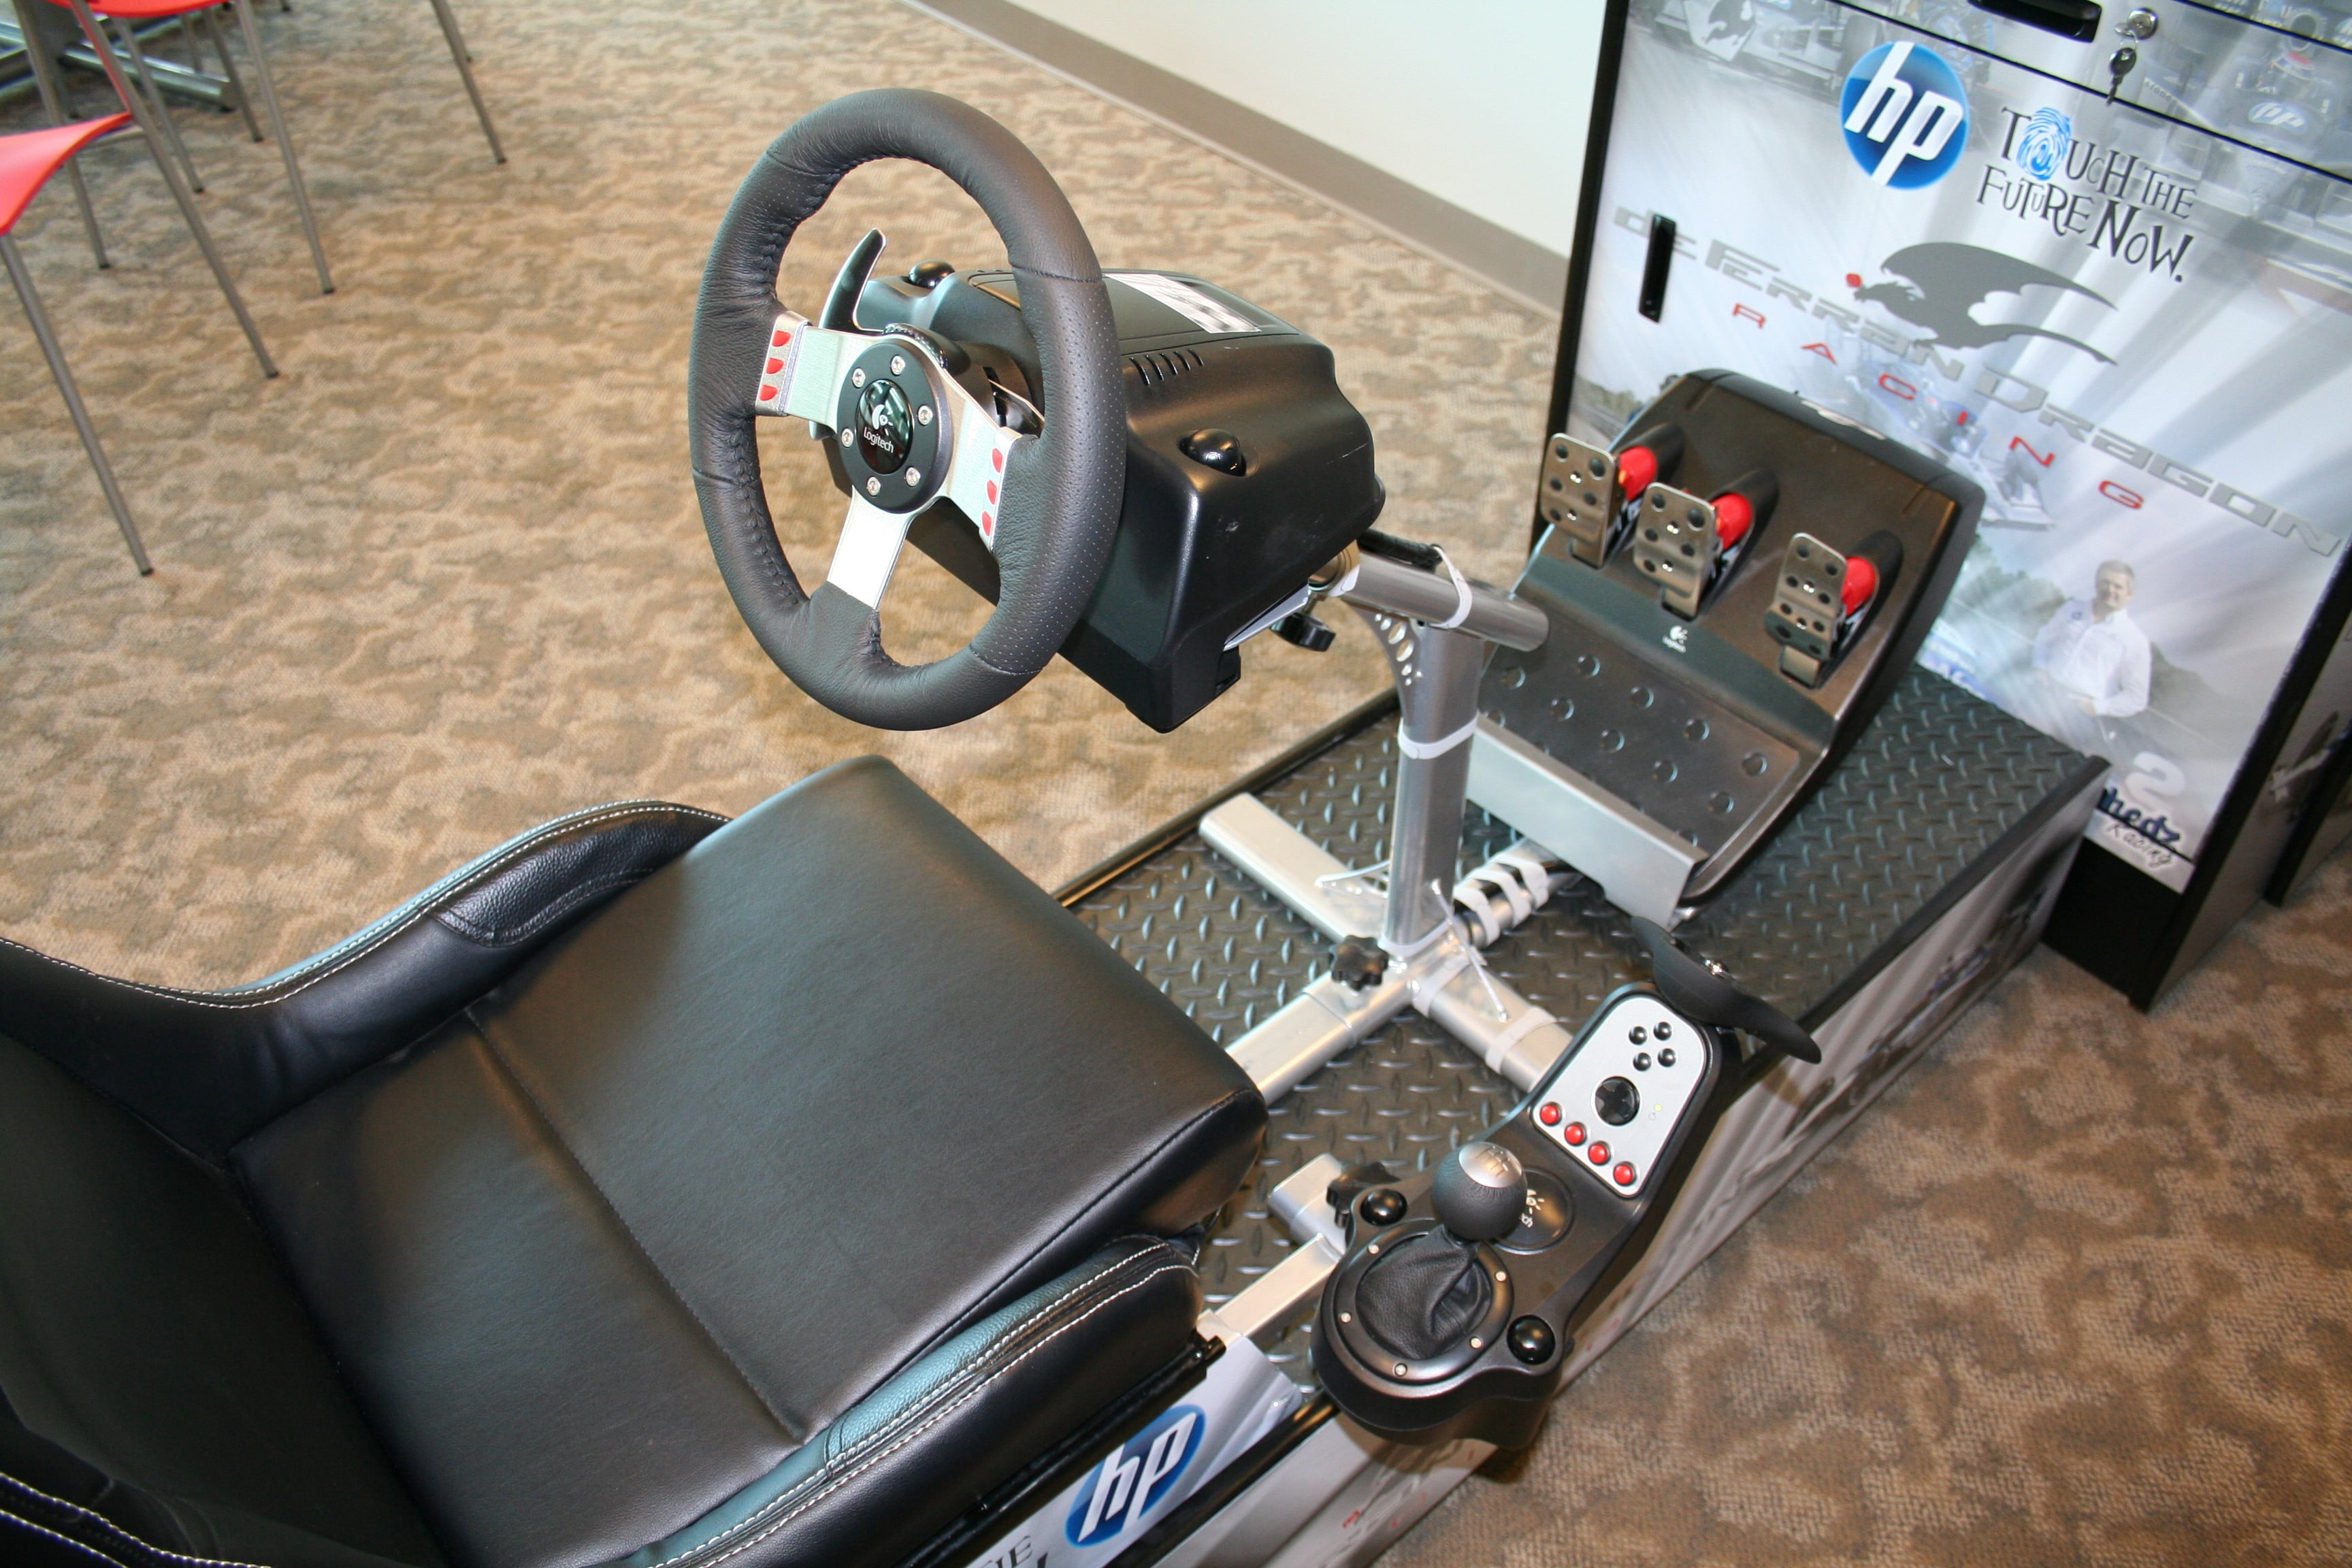 Home Arcade Racing Cabinet 1